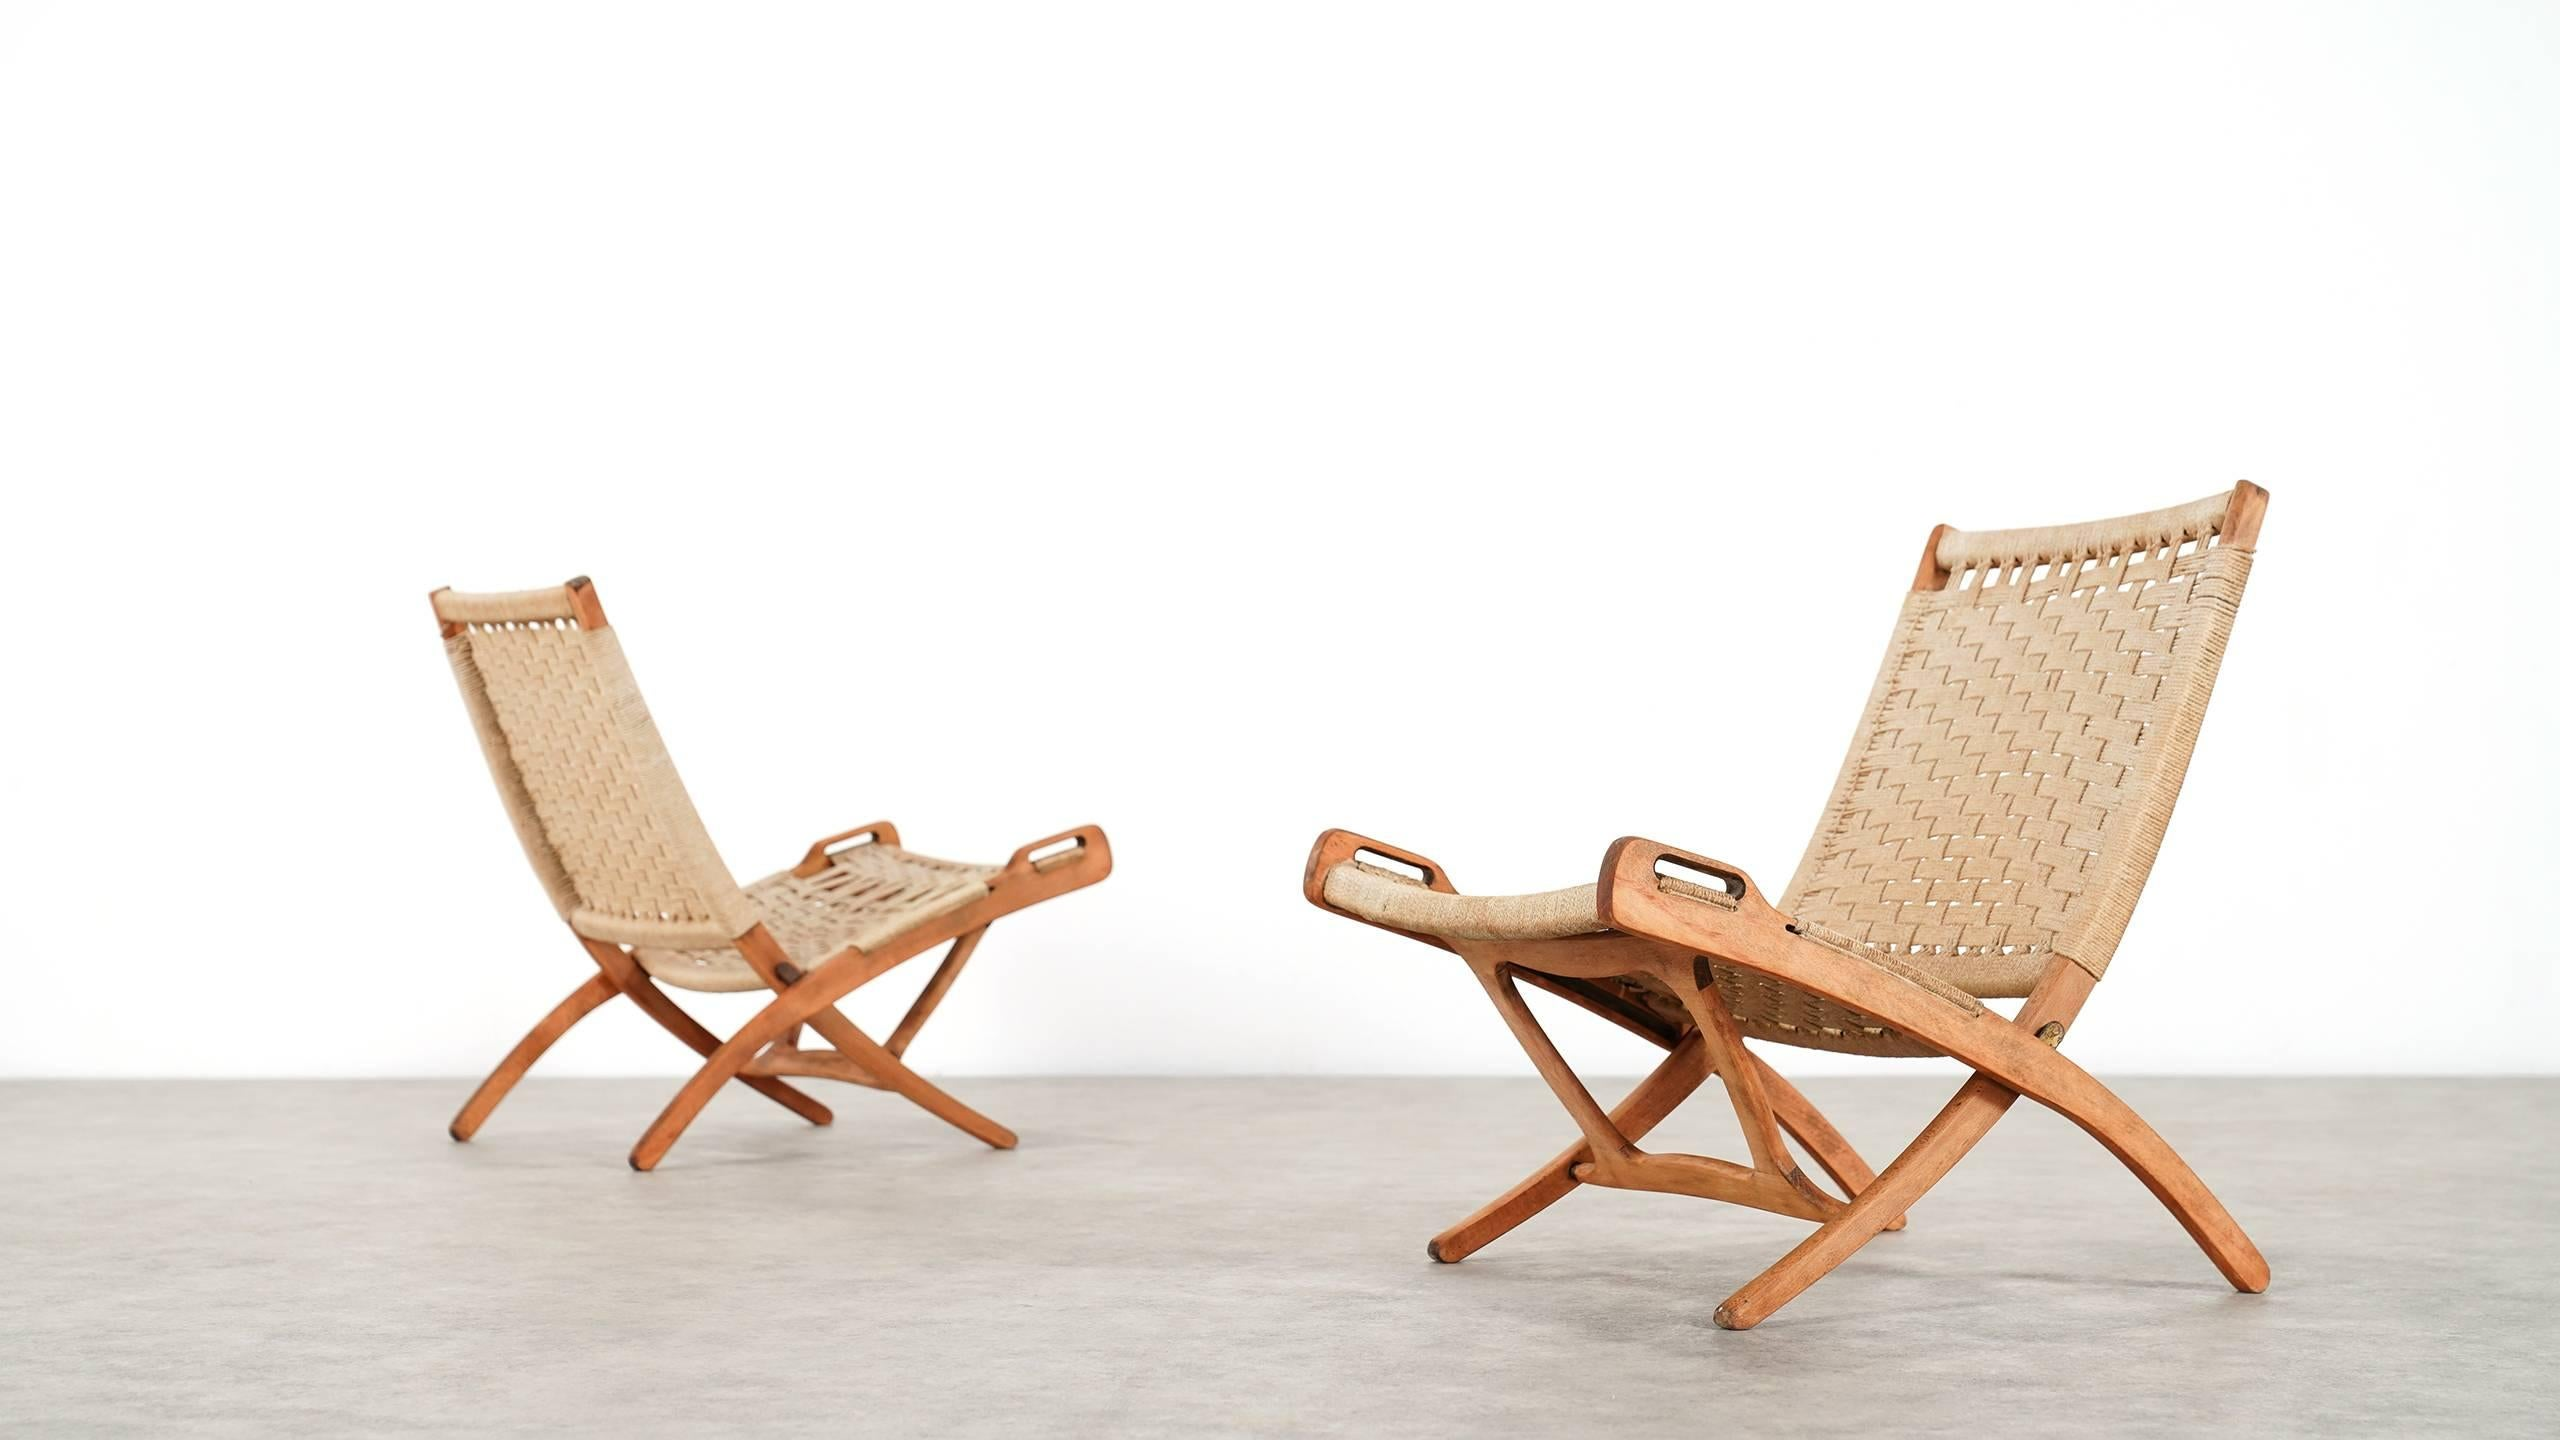 Mid Century Modern Folding Chair, Hans J. Wegner Style, Wood And Rope